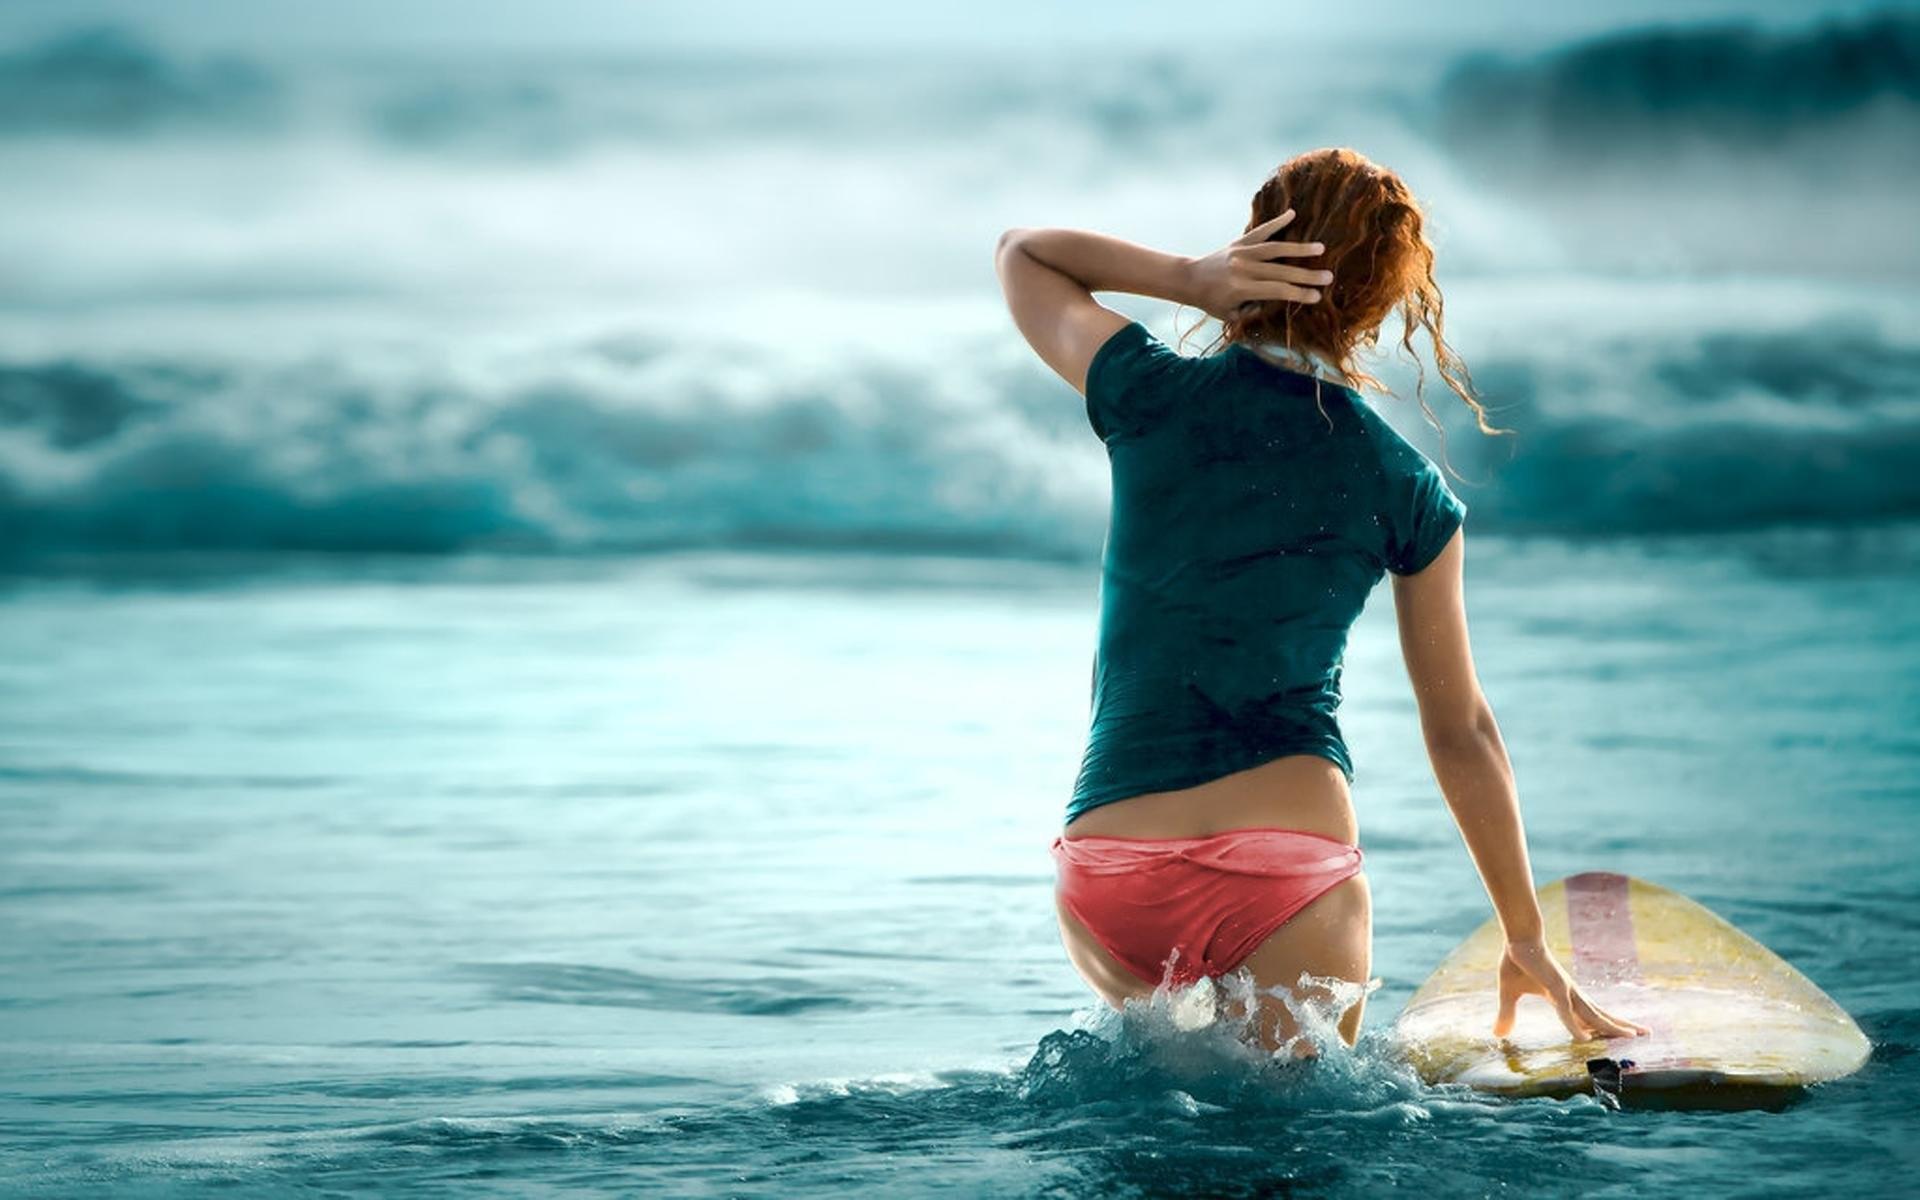 Surfing Girl HD Wallpaper 4 whb #SurfingGirlHDWallpaper #SurfingGirl # Surfing #Girls #babes #hotbabes #hotgirls #sexygirls #wallpapers  #hdwallpape…